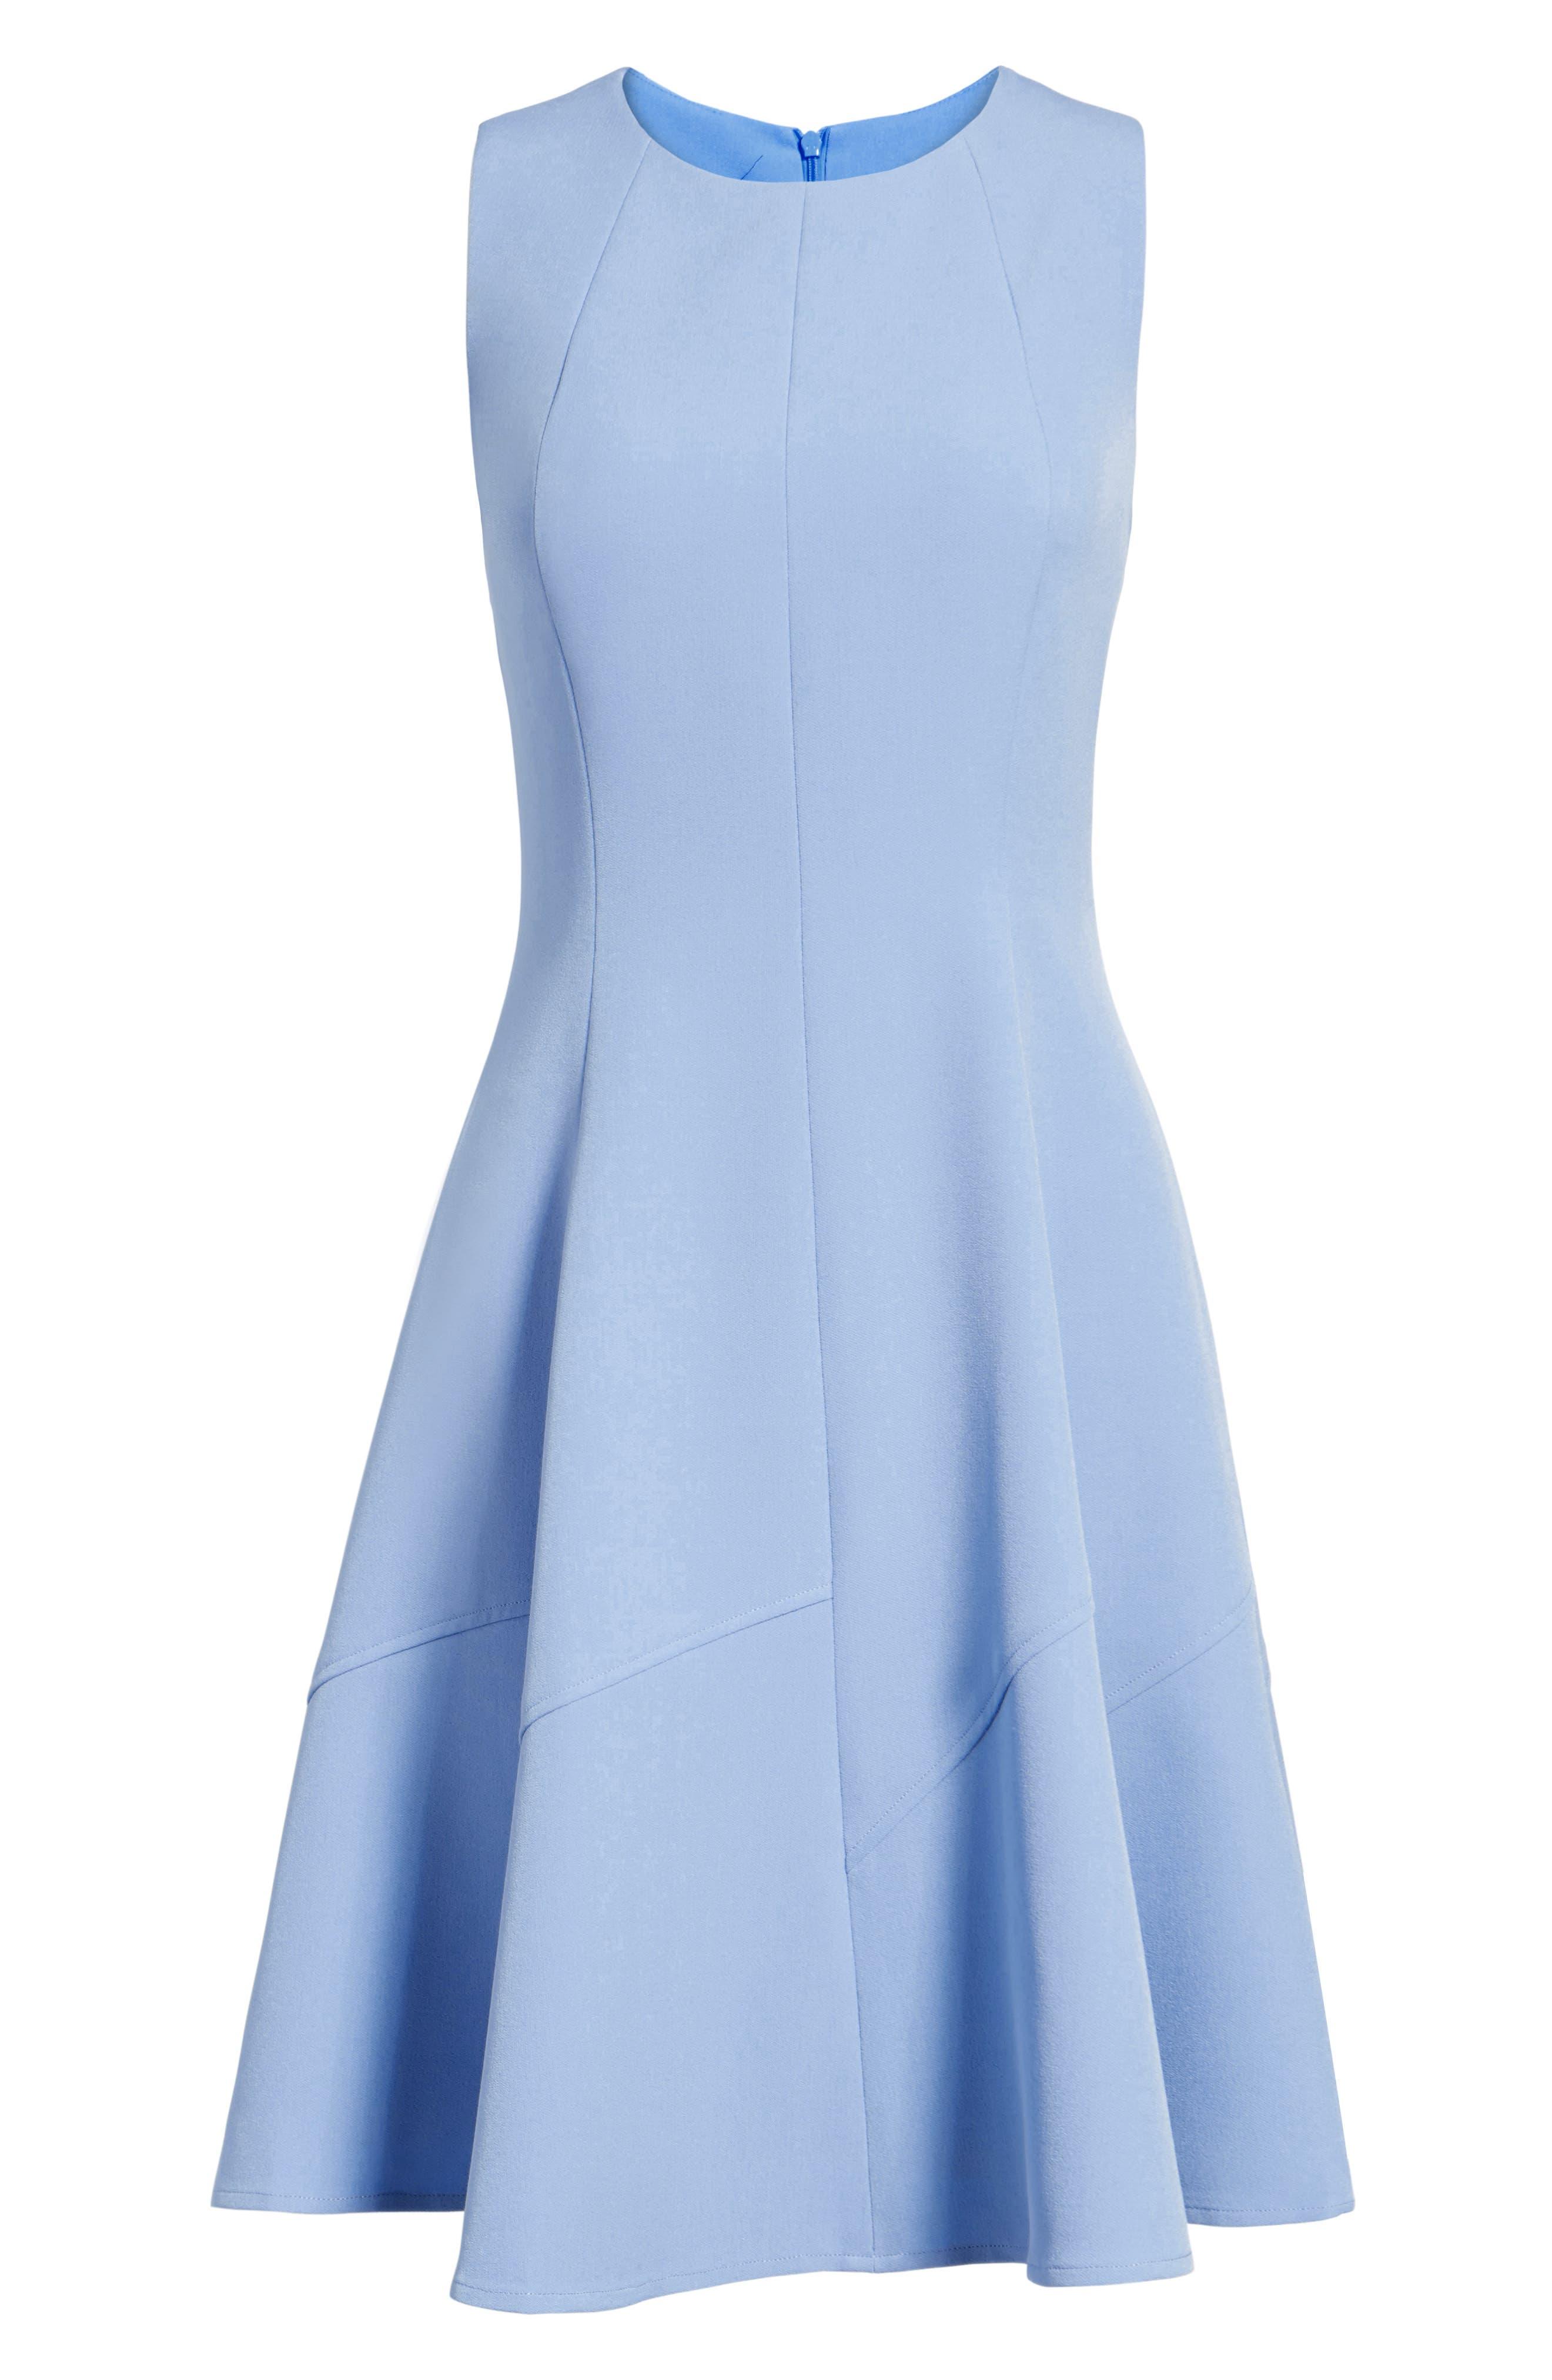 Fit & Flare Dress,                             Alternate thumbnail 7, color,                             430